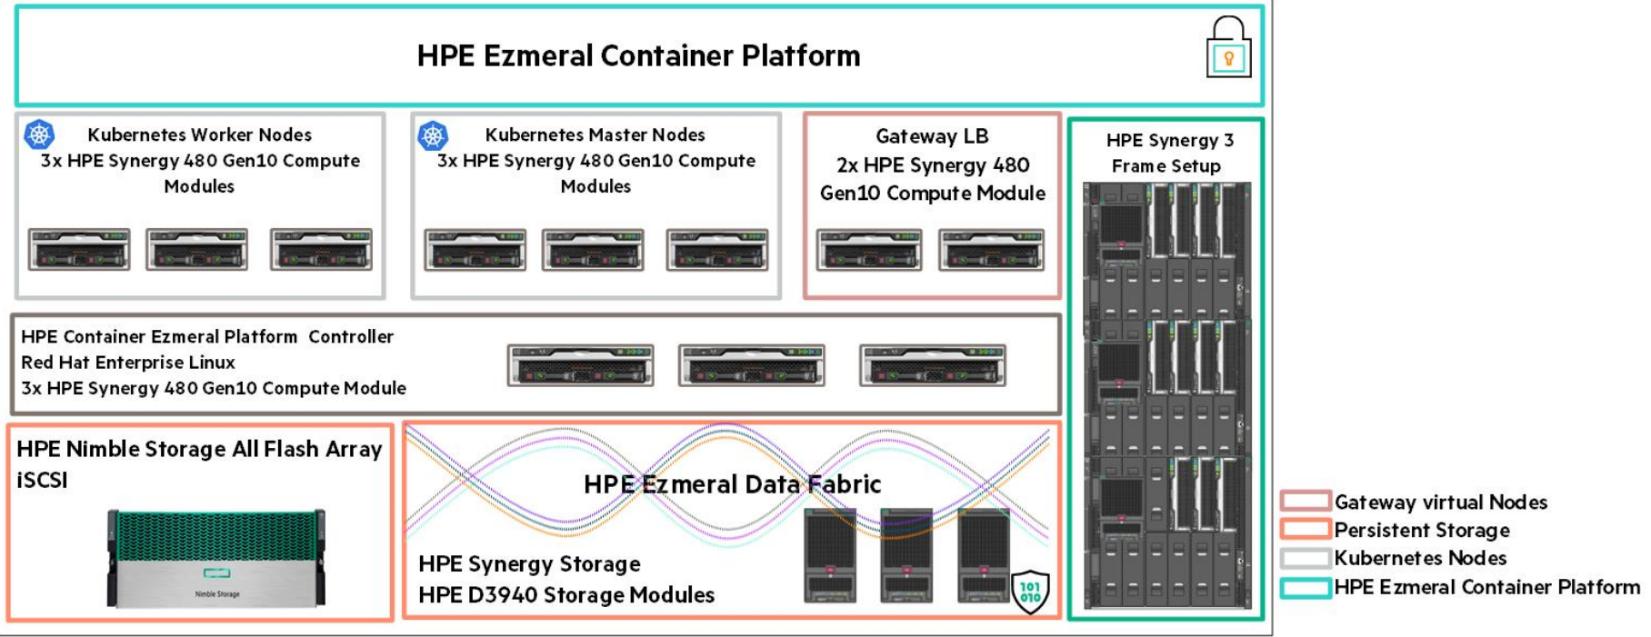 Figure 2. HPE Ezmeral Container Platform Solution Architecture